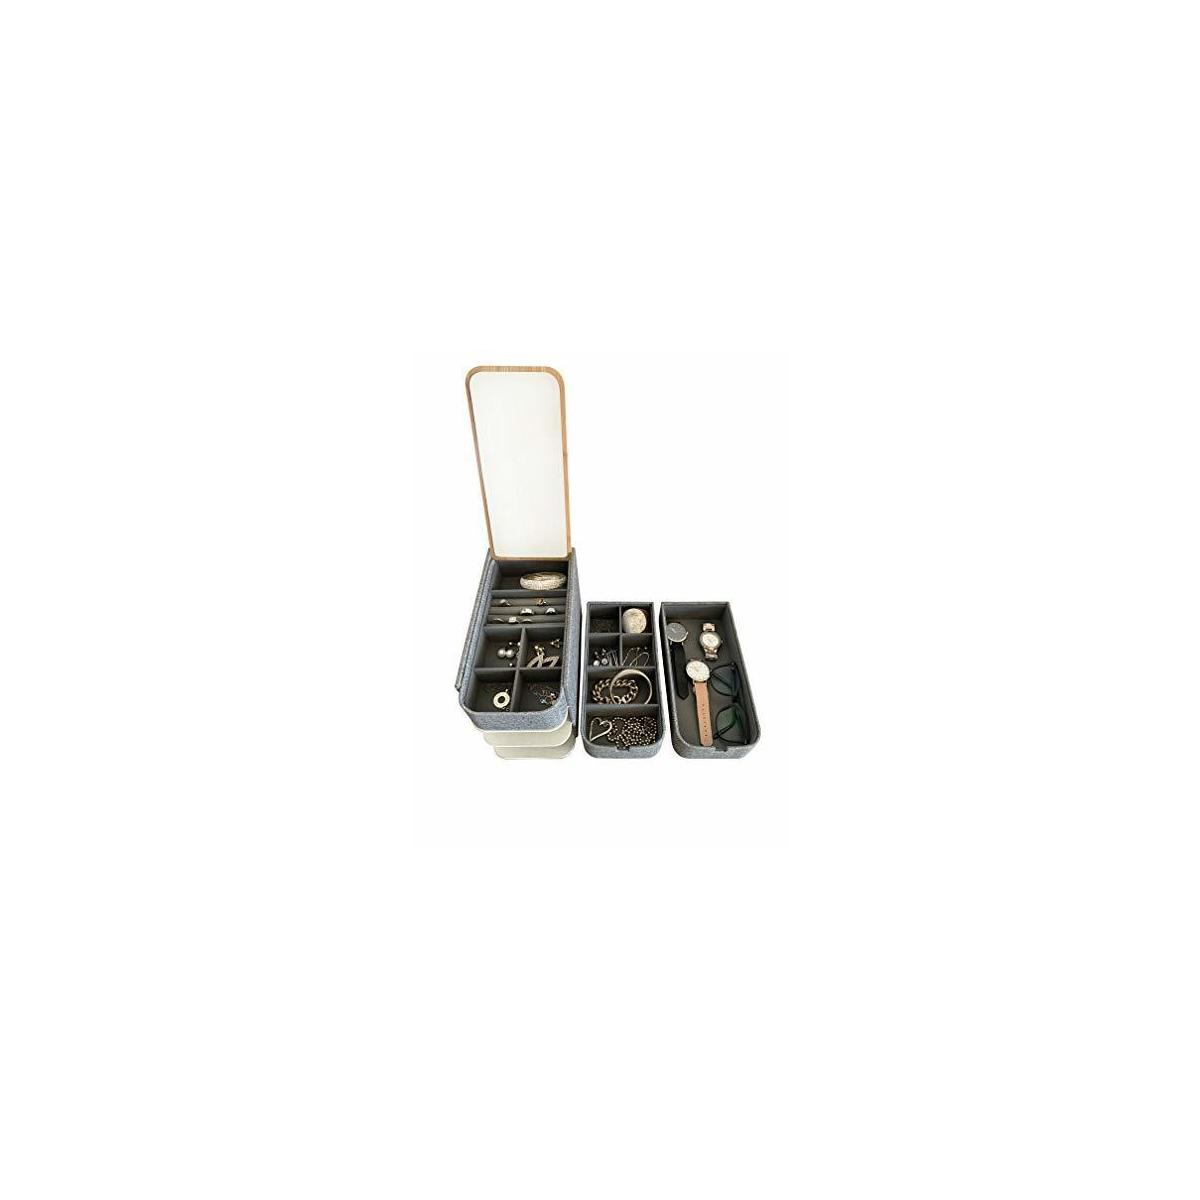 TILLYJ Jewelry Box for Women, Organizer Storage, 3 Drawer Fabric Jewelry Boxes, Triple Layer Large Jewelry Organizer Box Holder, Bamboo Lid with Mirror, Jewerly Box Case, Jewlery Box